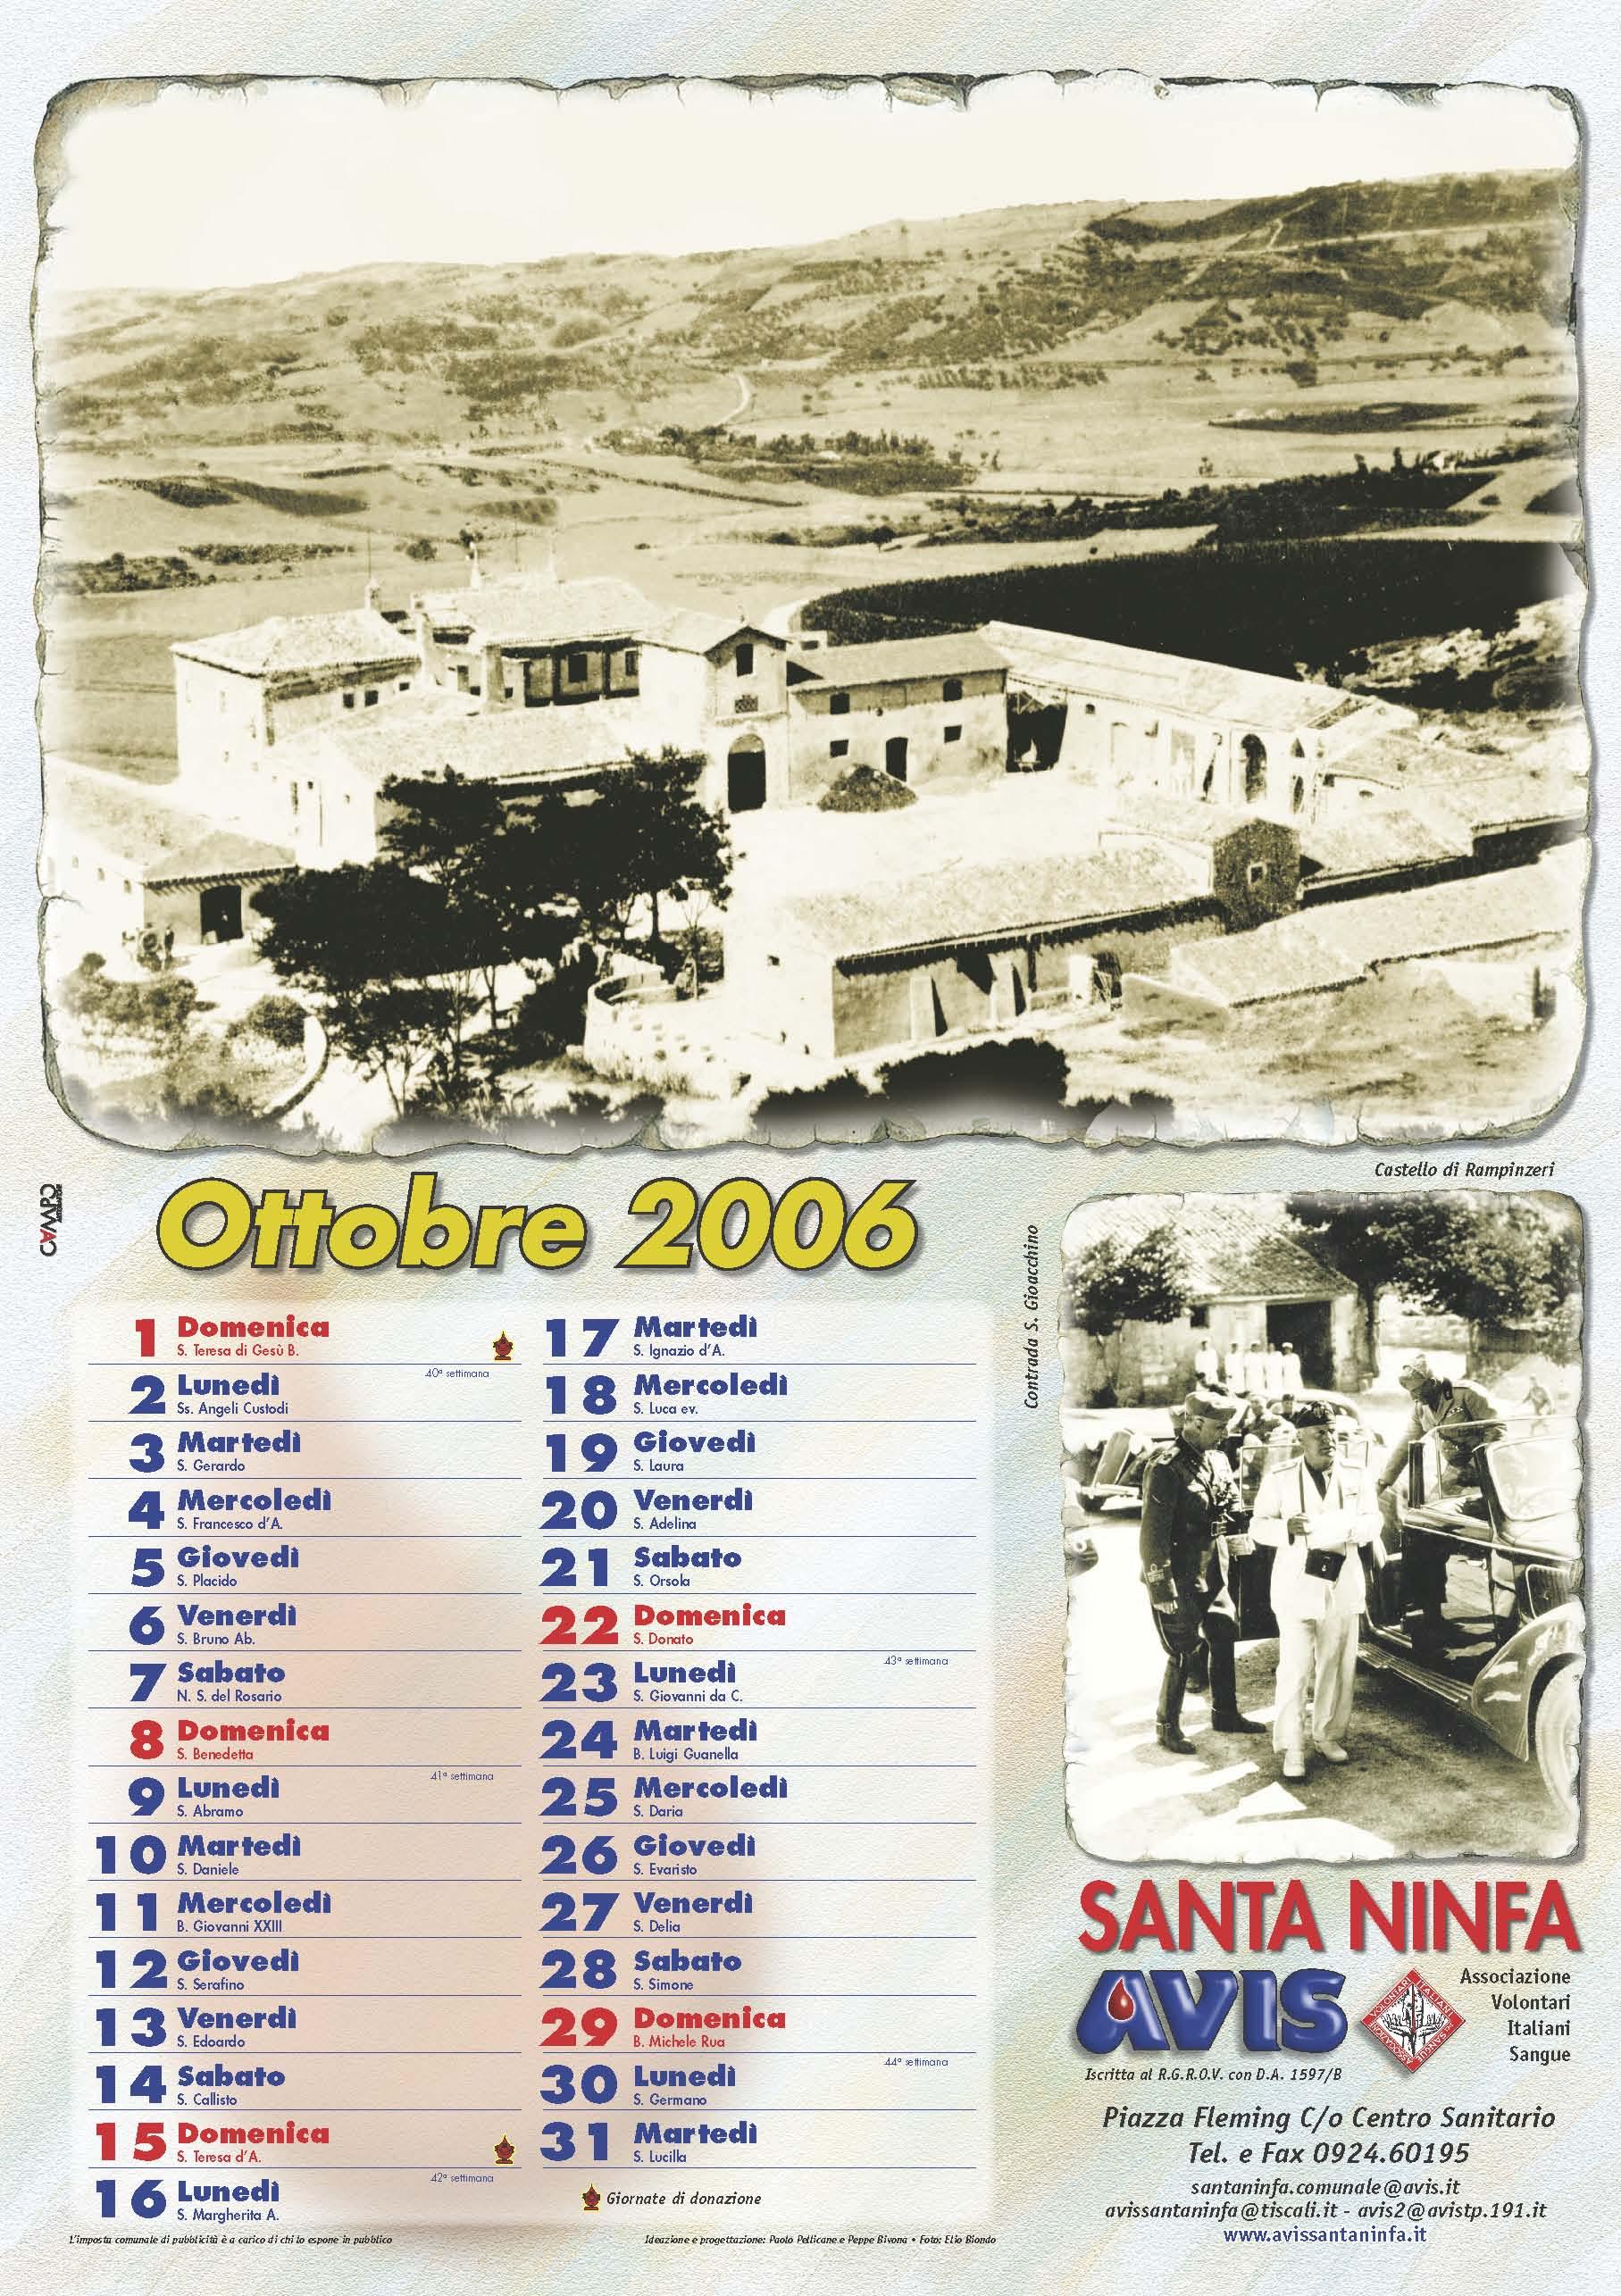 Calendario Avis.Calendario Avis 2006 Avis Santa Ninfa